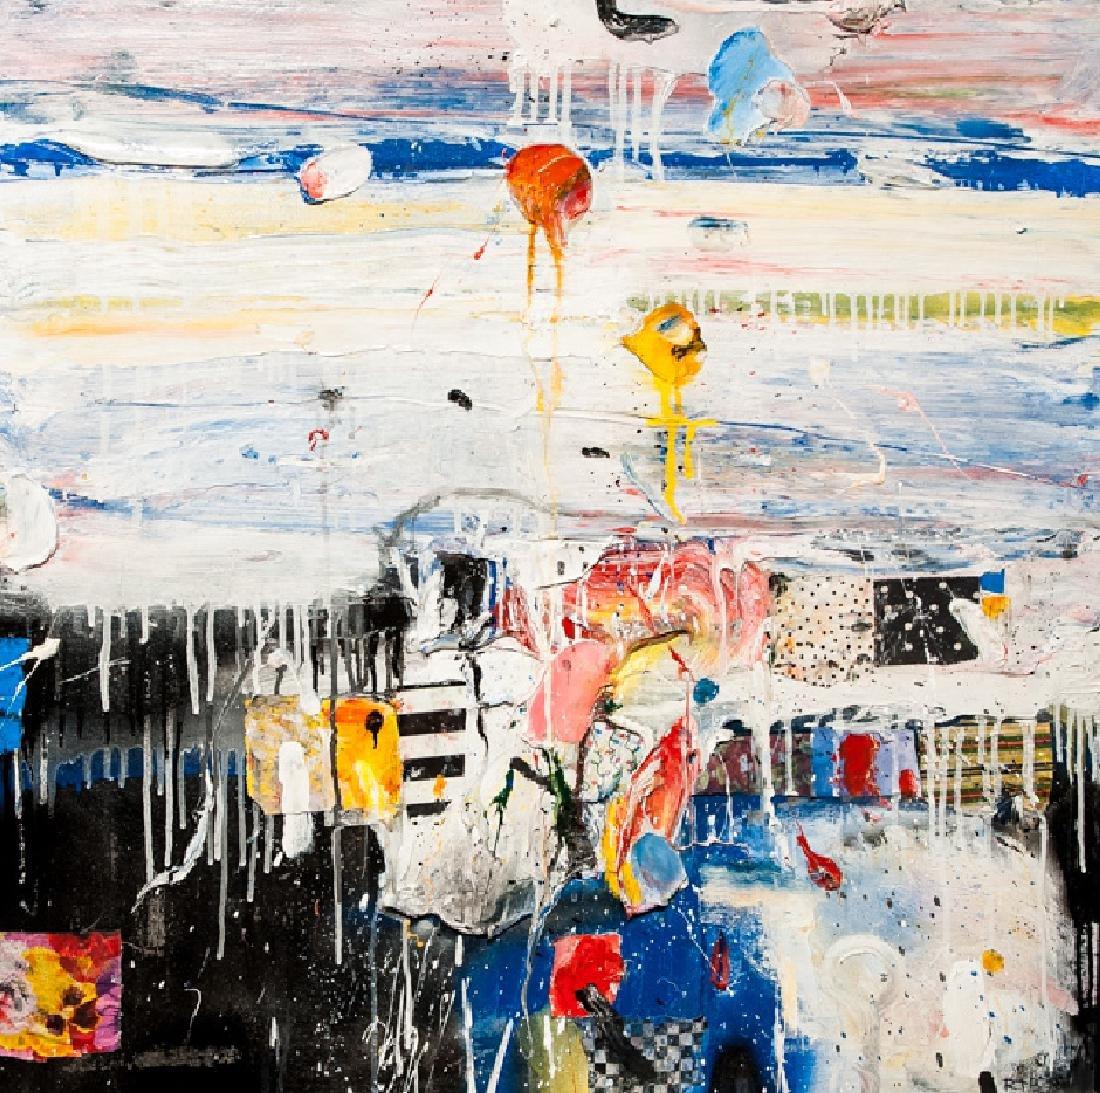 Robert Baribeau, Abstract Seascape, Mixed Media